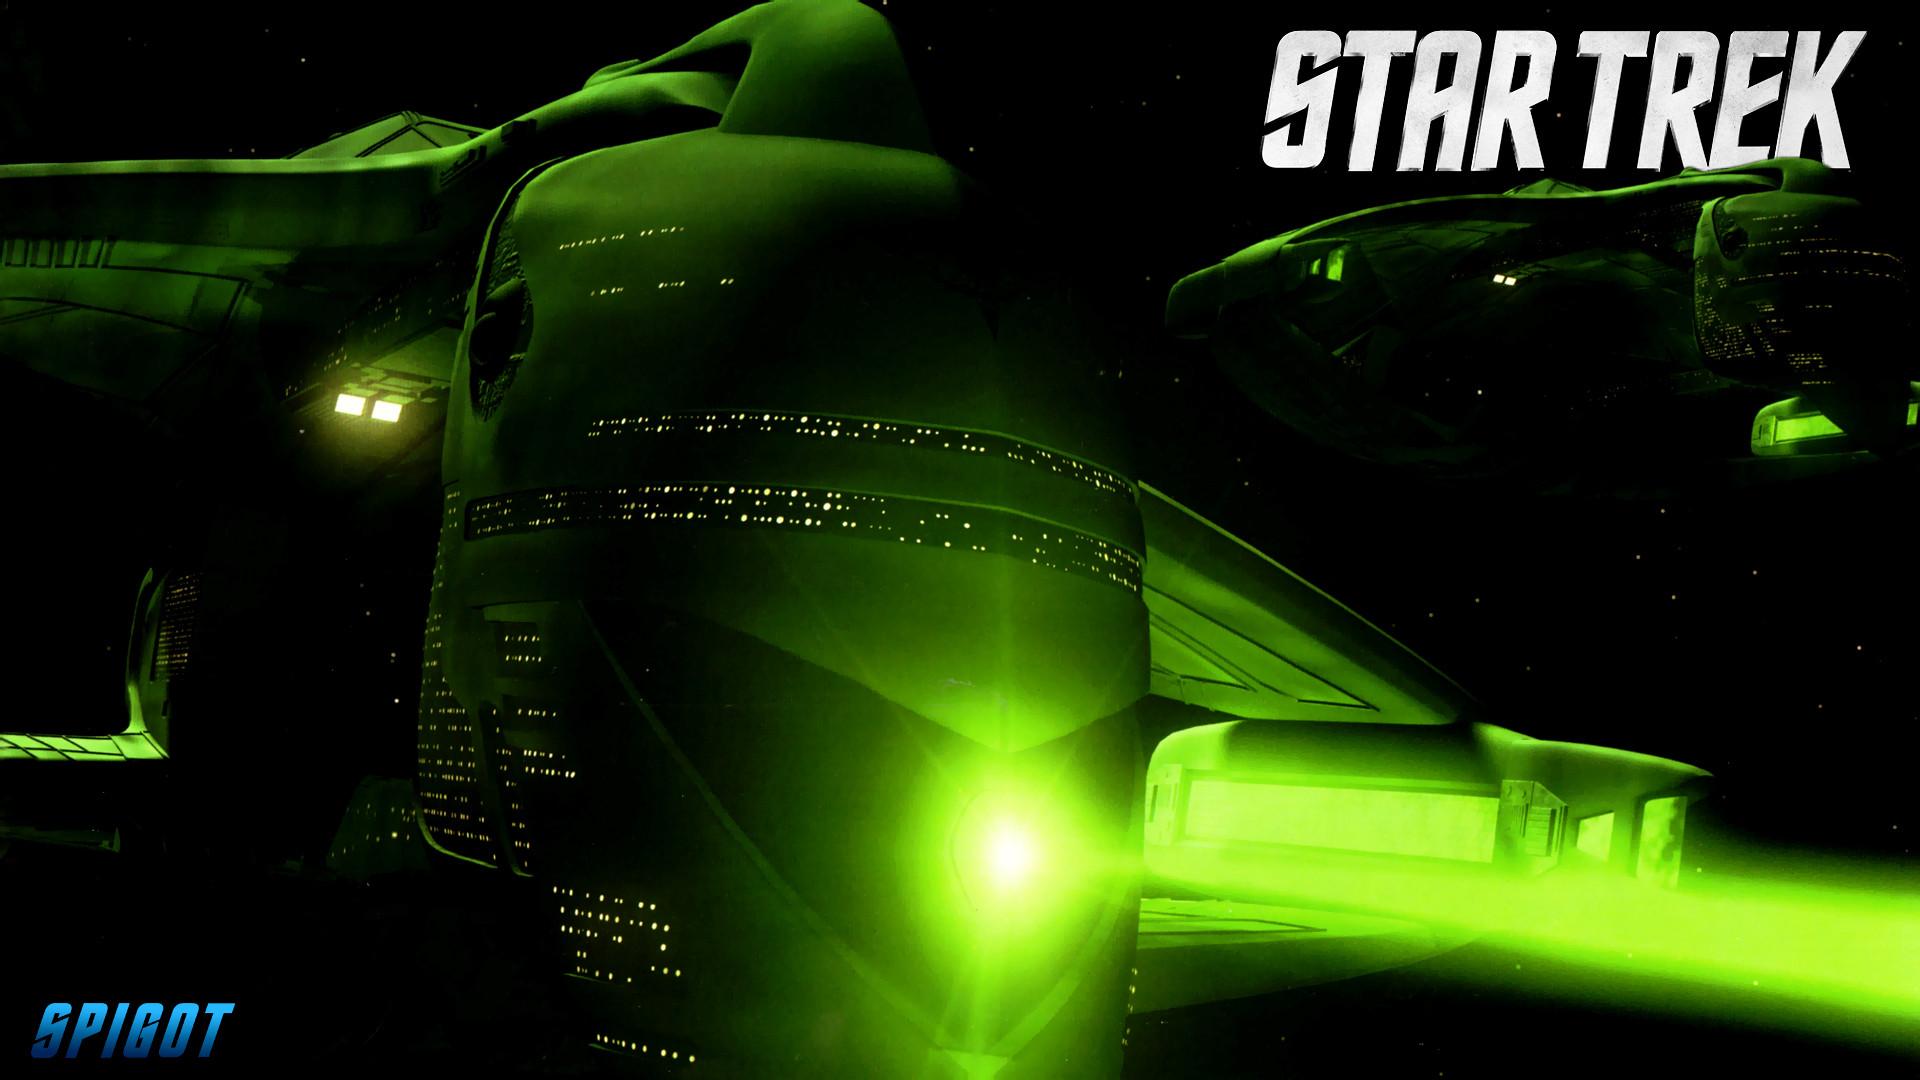 Here's the last few Star Trek wallpapers …